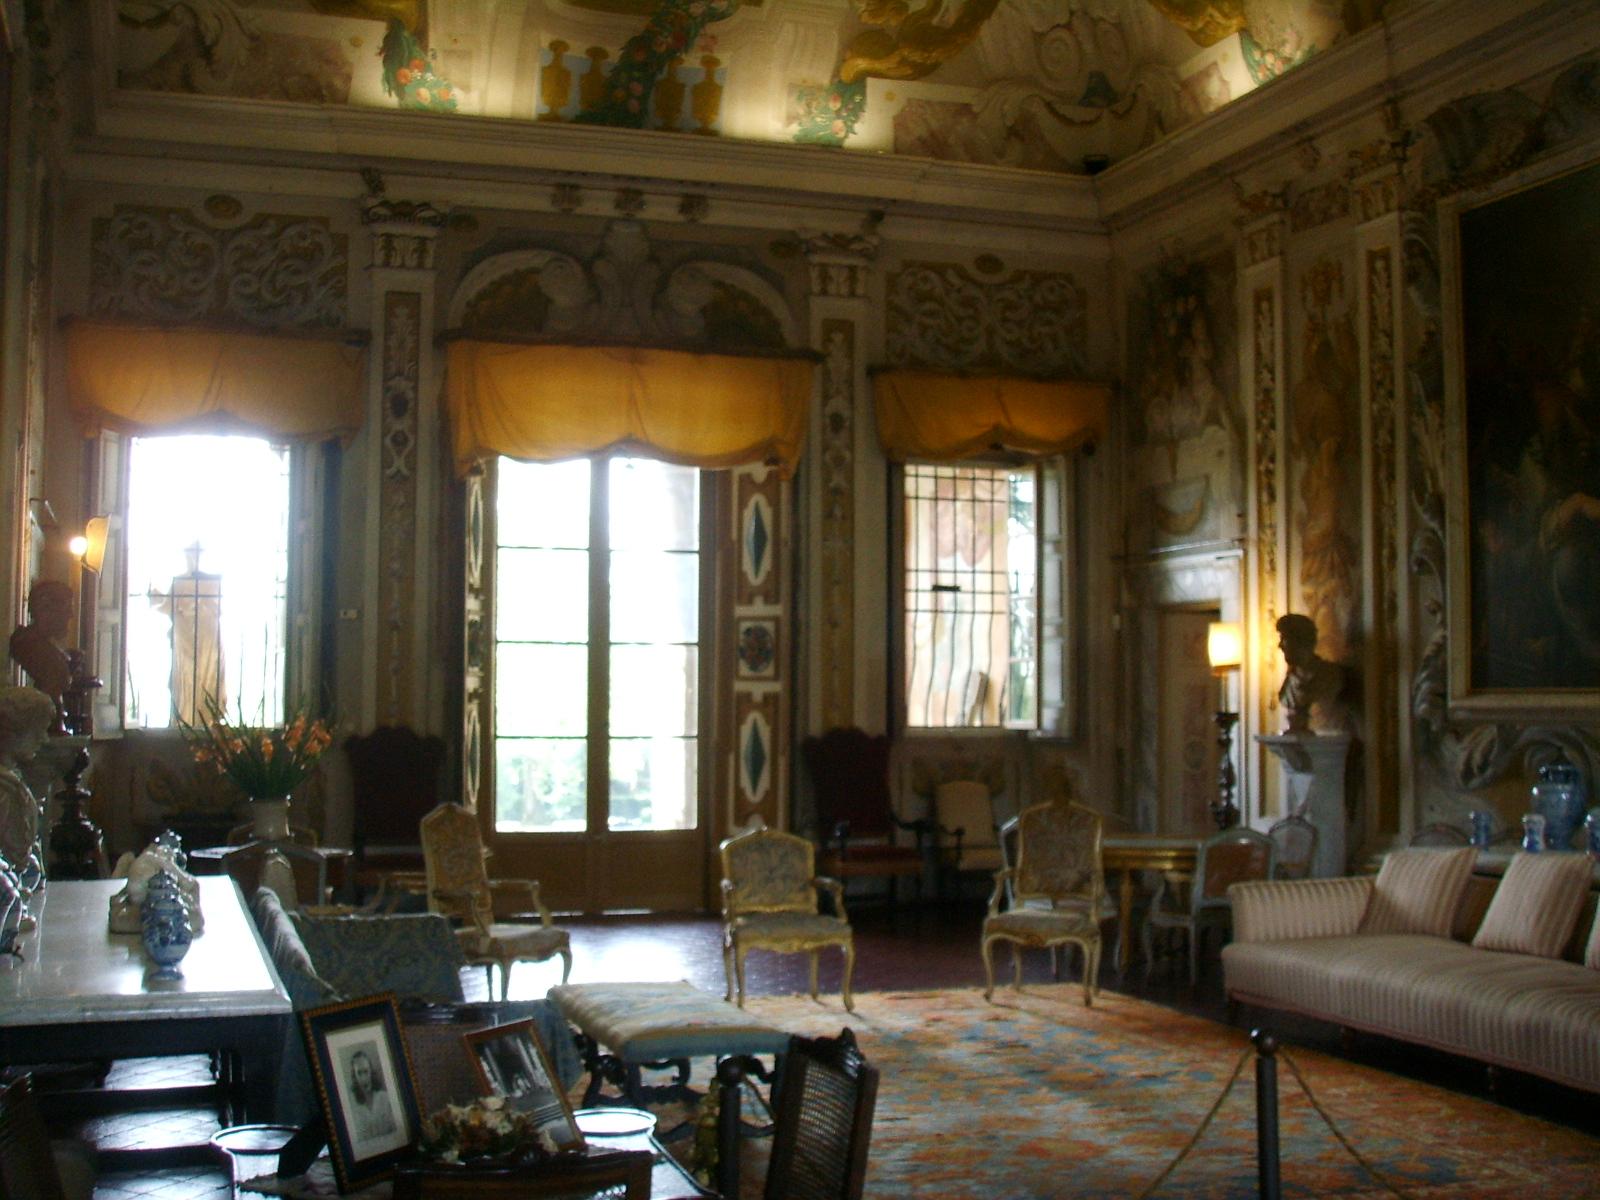 file villa torrigiani di lucca interno 03 jpg